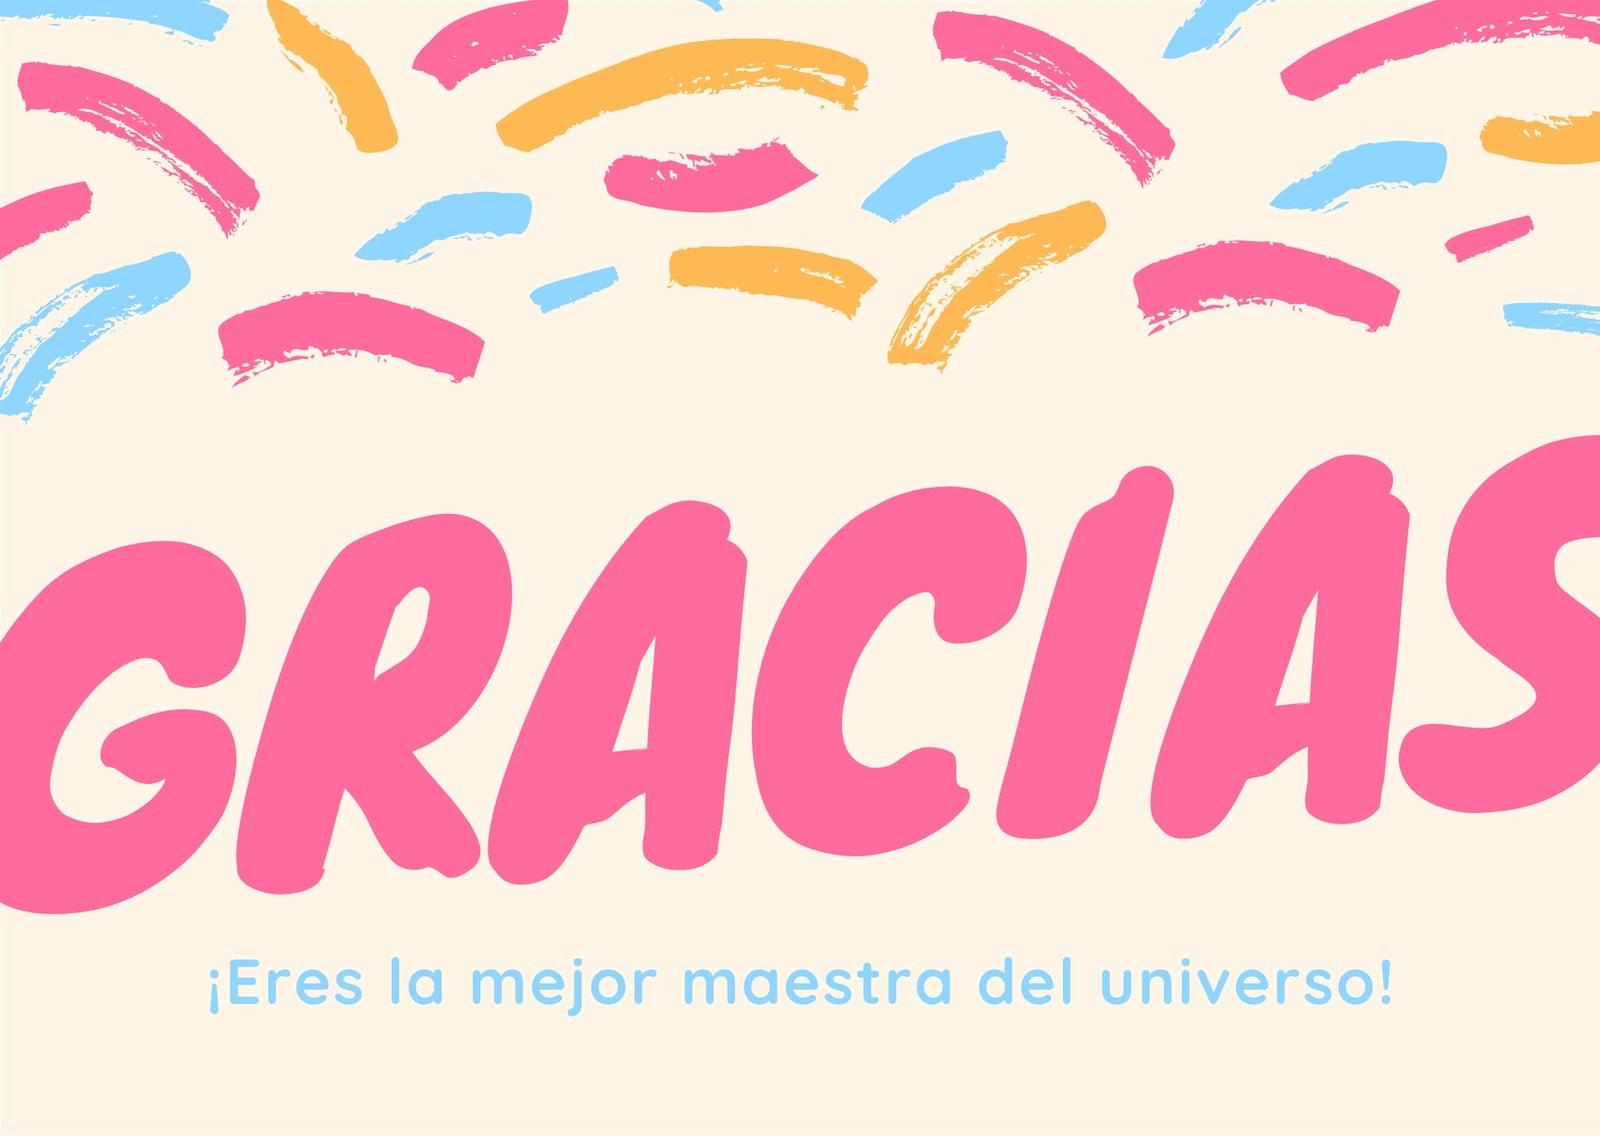 Rosa Negrita Maestra Agradecimiento Tarjeta